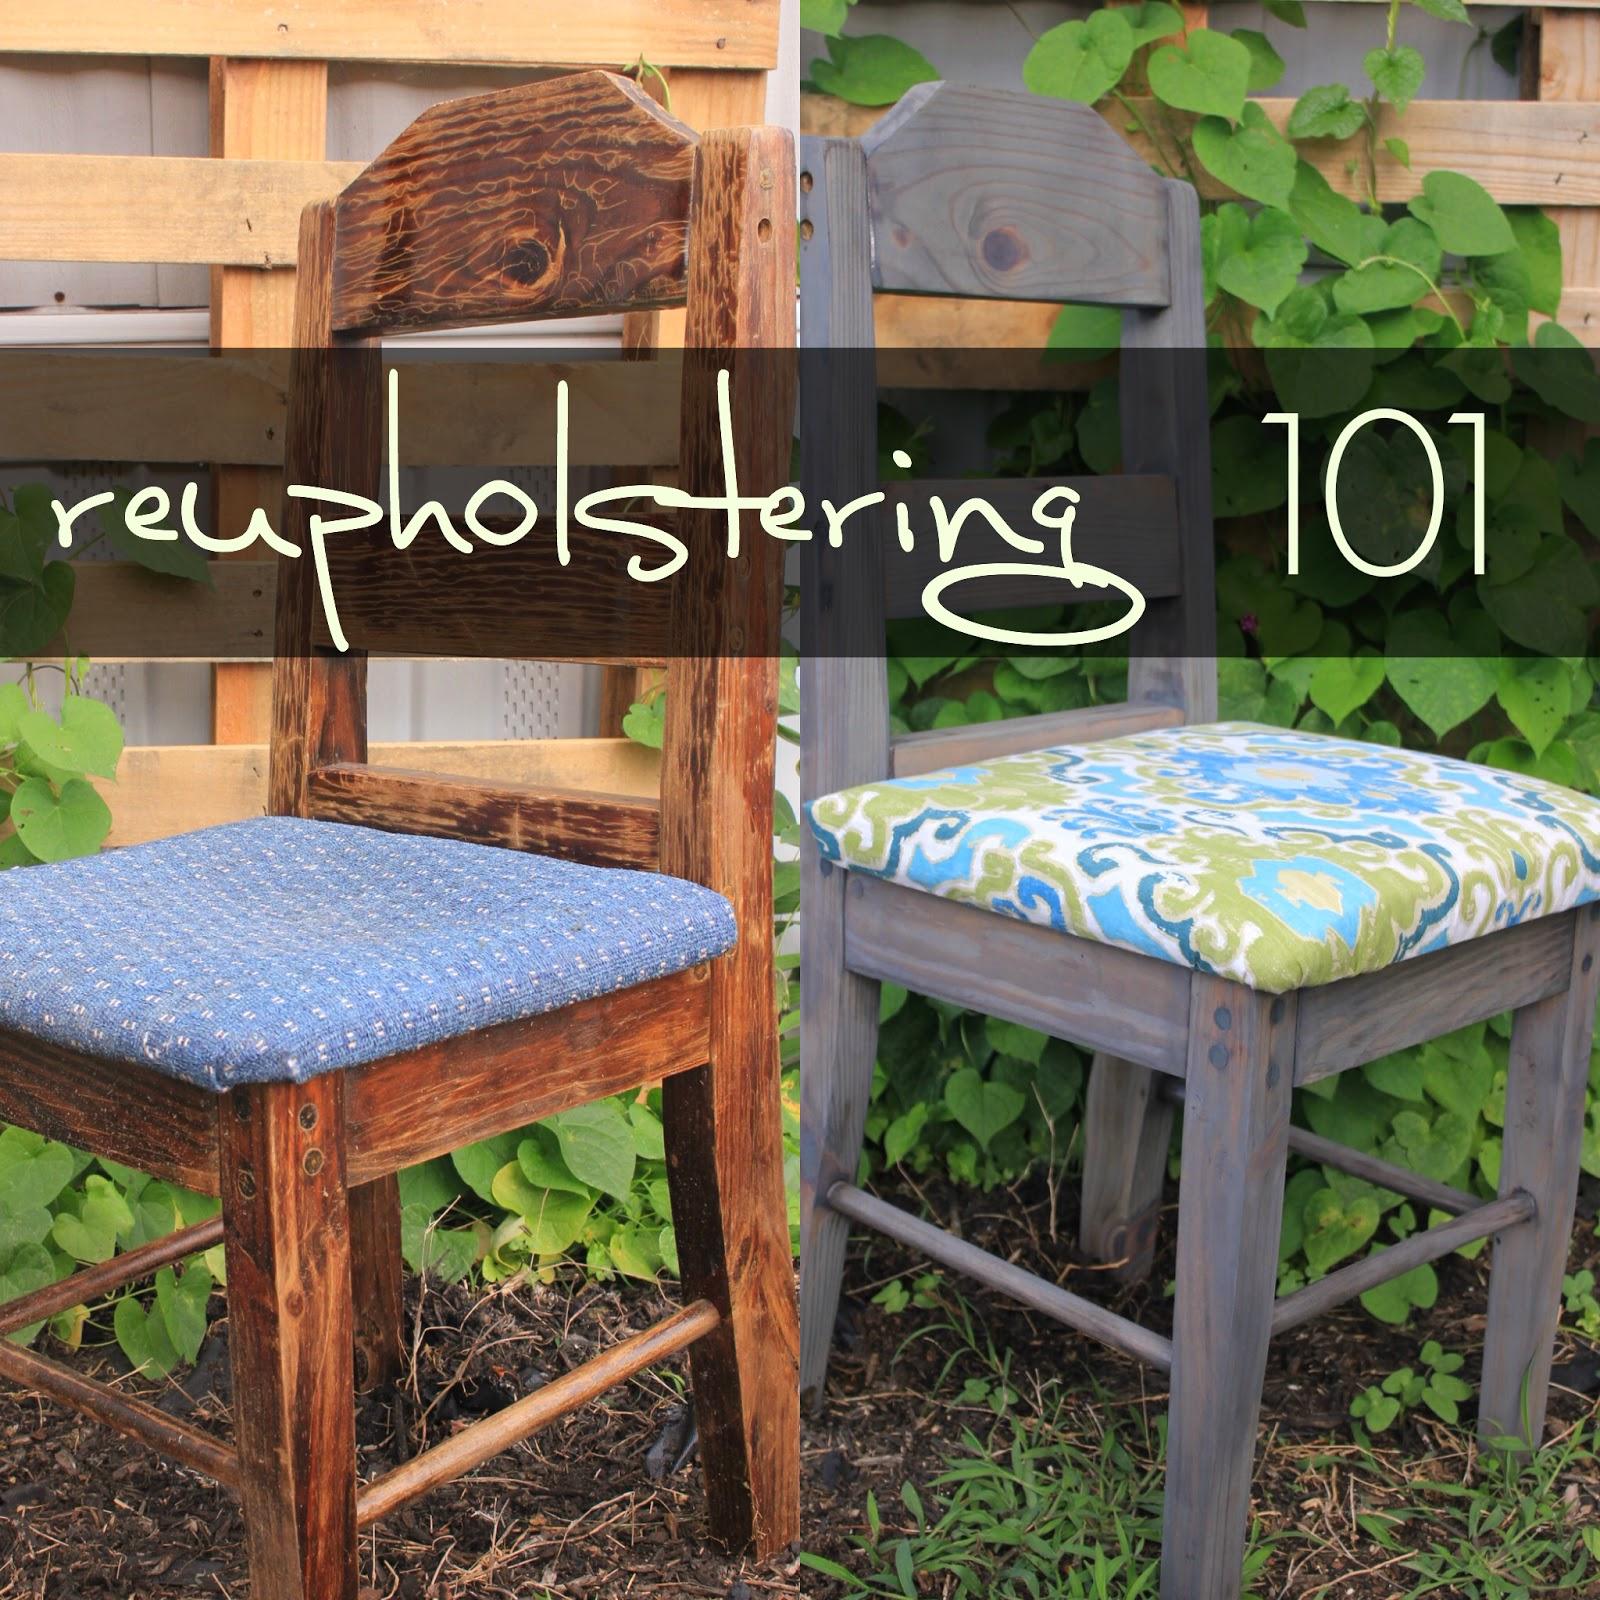 reupholstering, chair reupholster, diy project, diy reupholster,